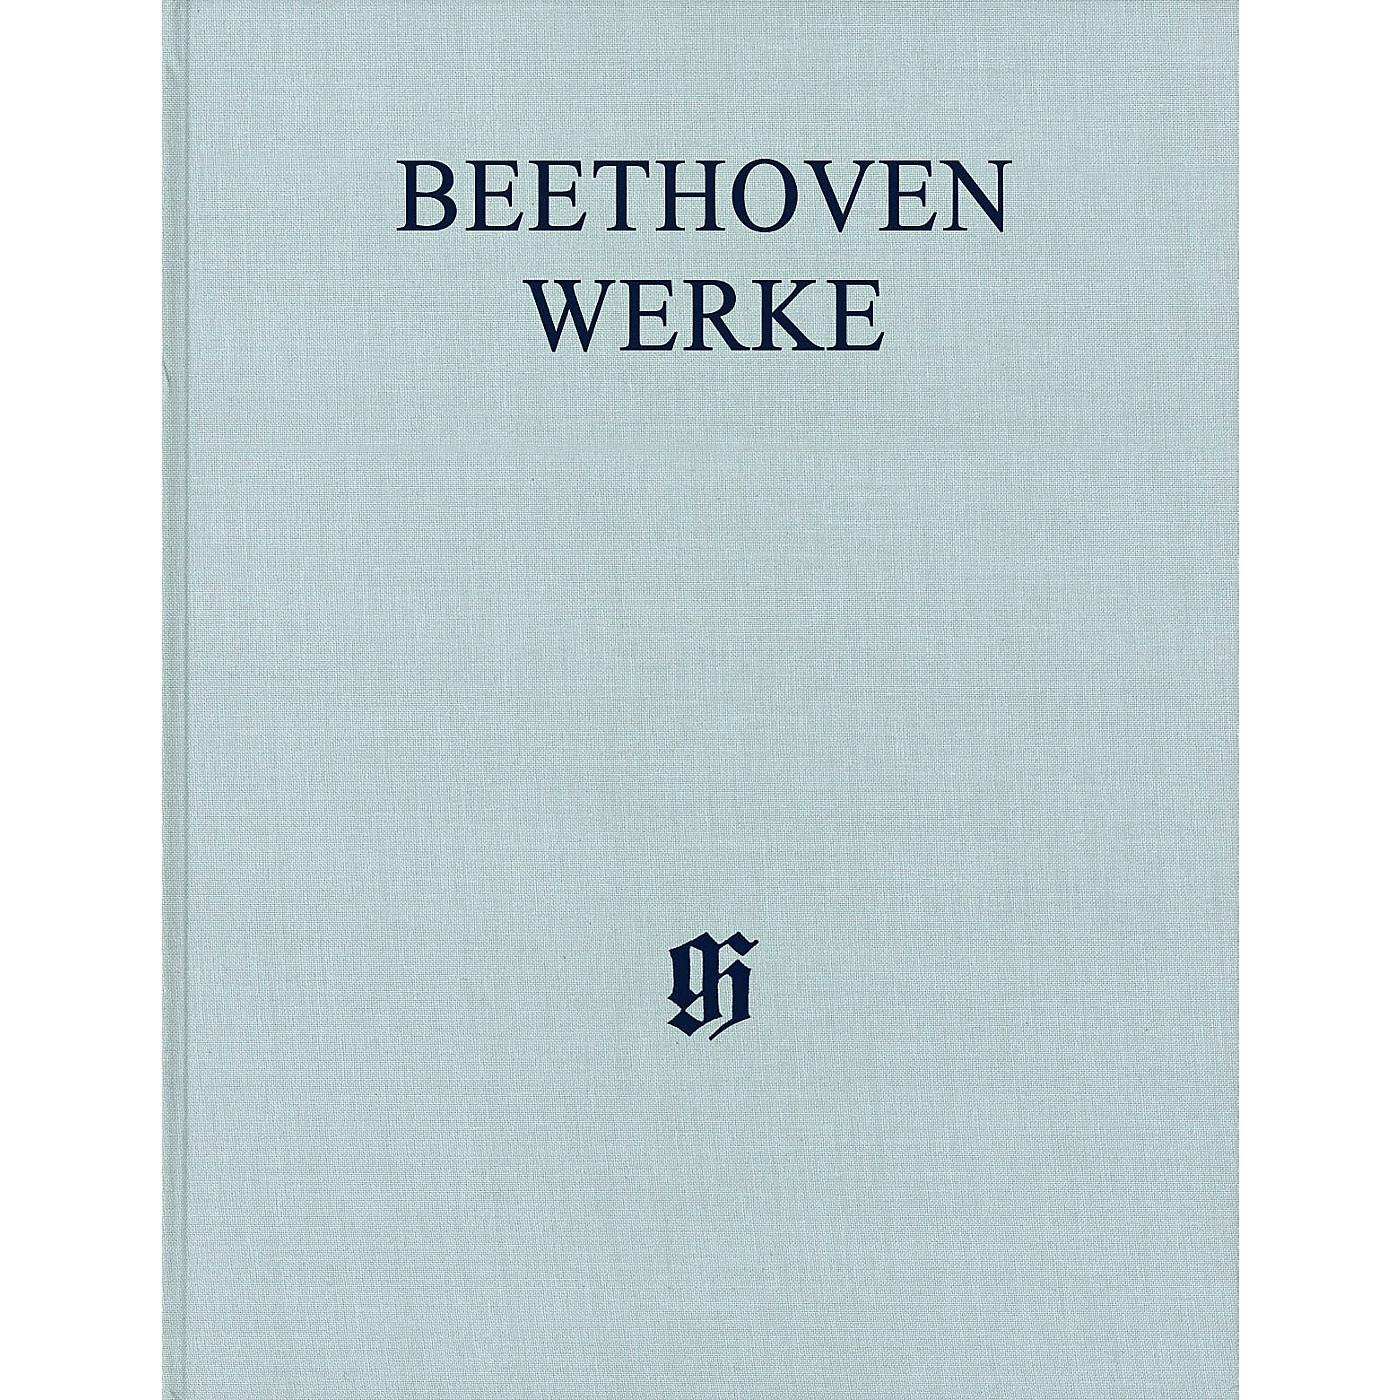 G. Henle Verlag Festspiele von 1812 Und 1822 Henle Edition Hardcover by Beethoven Edited by Helmut Hell thumbnail